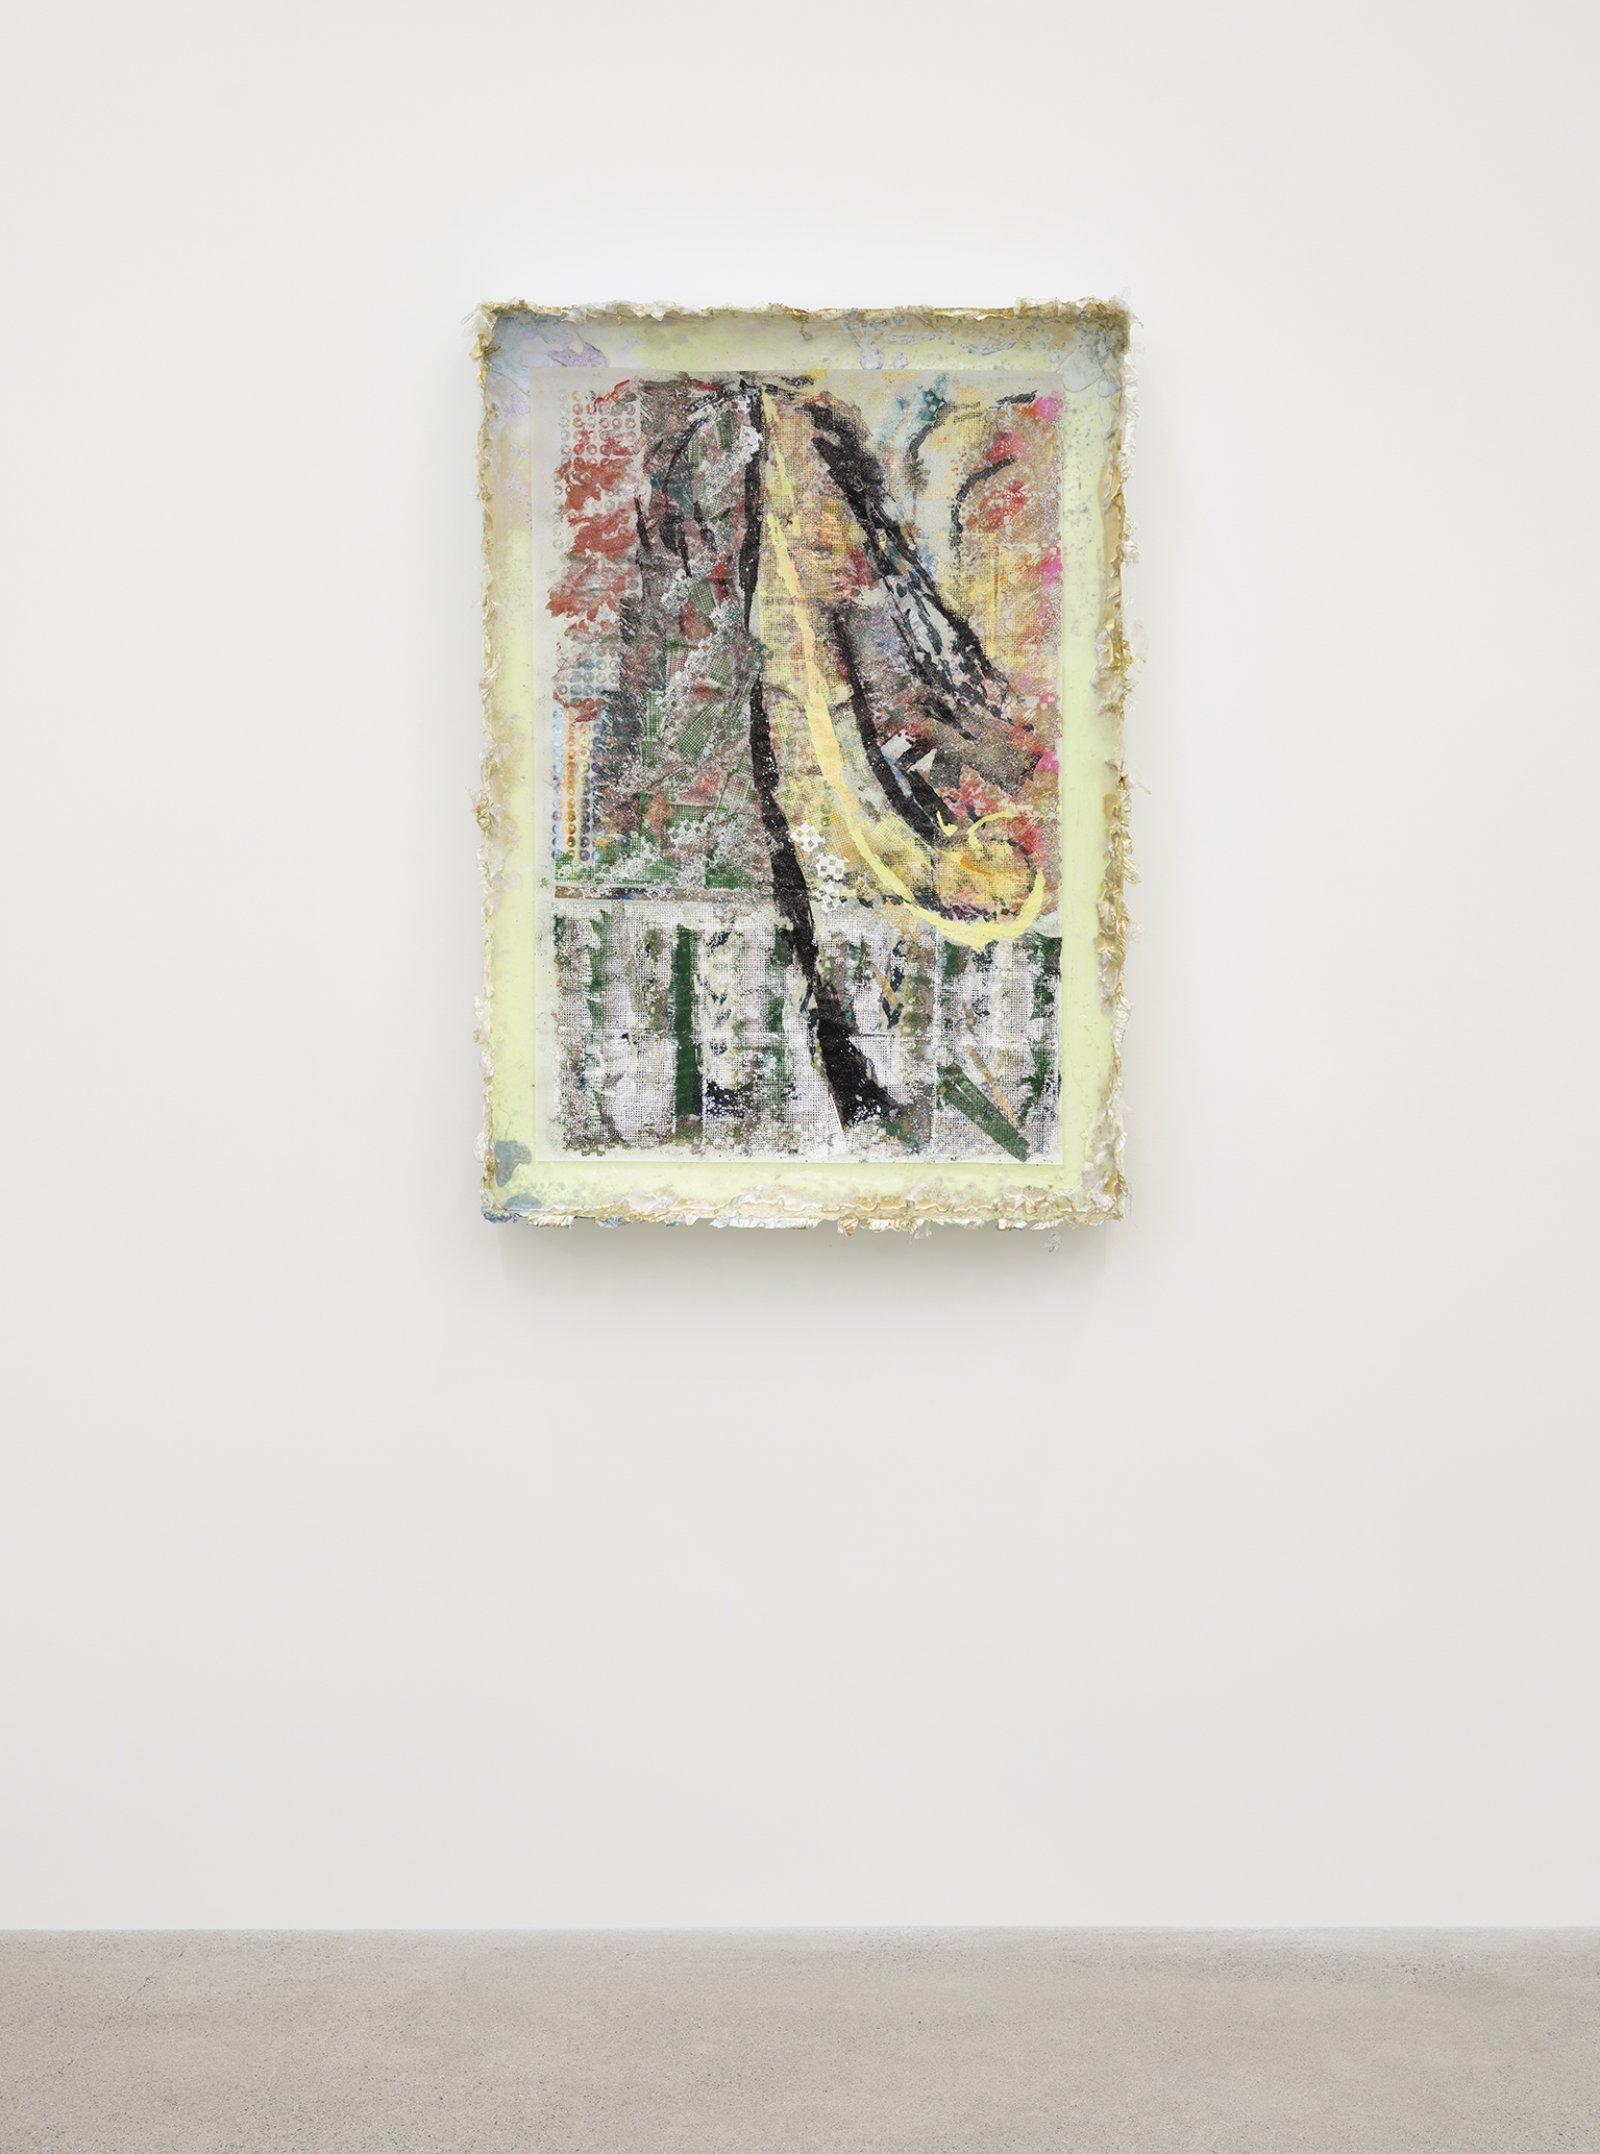 Rebecca Brewer, Live Resin: Garbage Wave, 2019, urethane resin, aluminum mesh, pigment, plexiglas, embossing powder on vellum, 41 x 29 in. (104 x 74 cm)